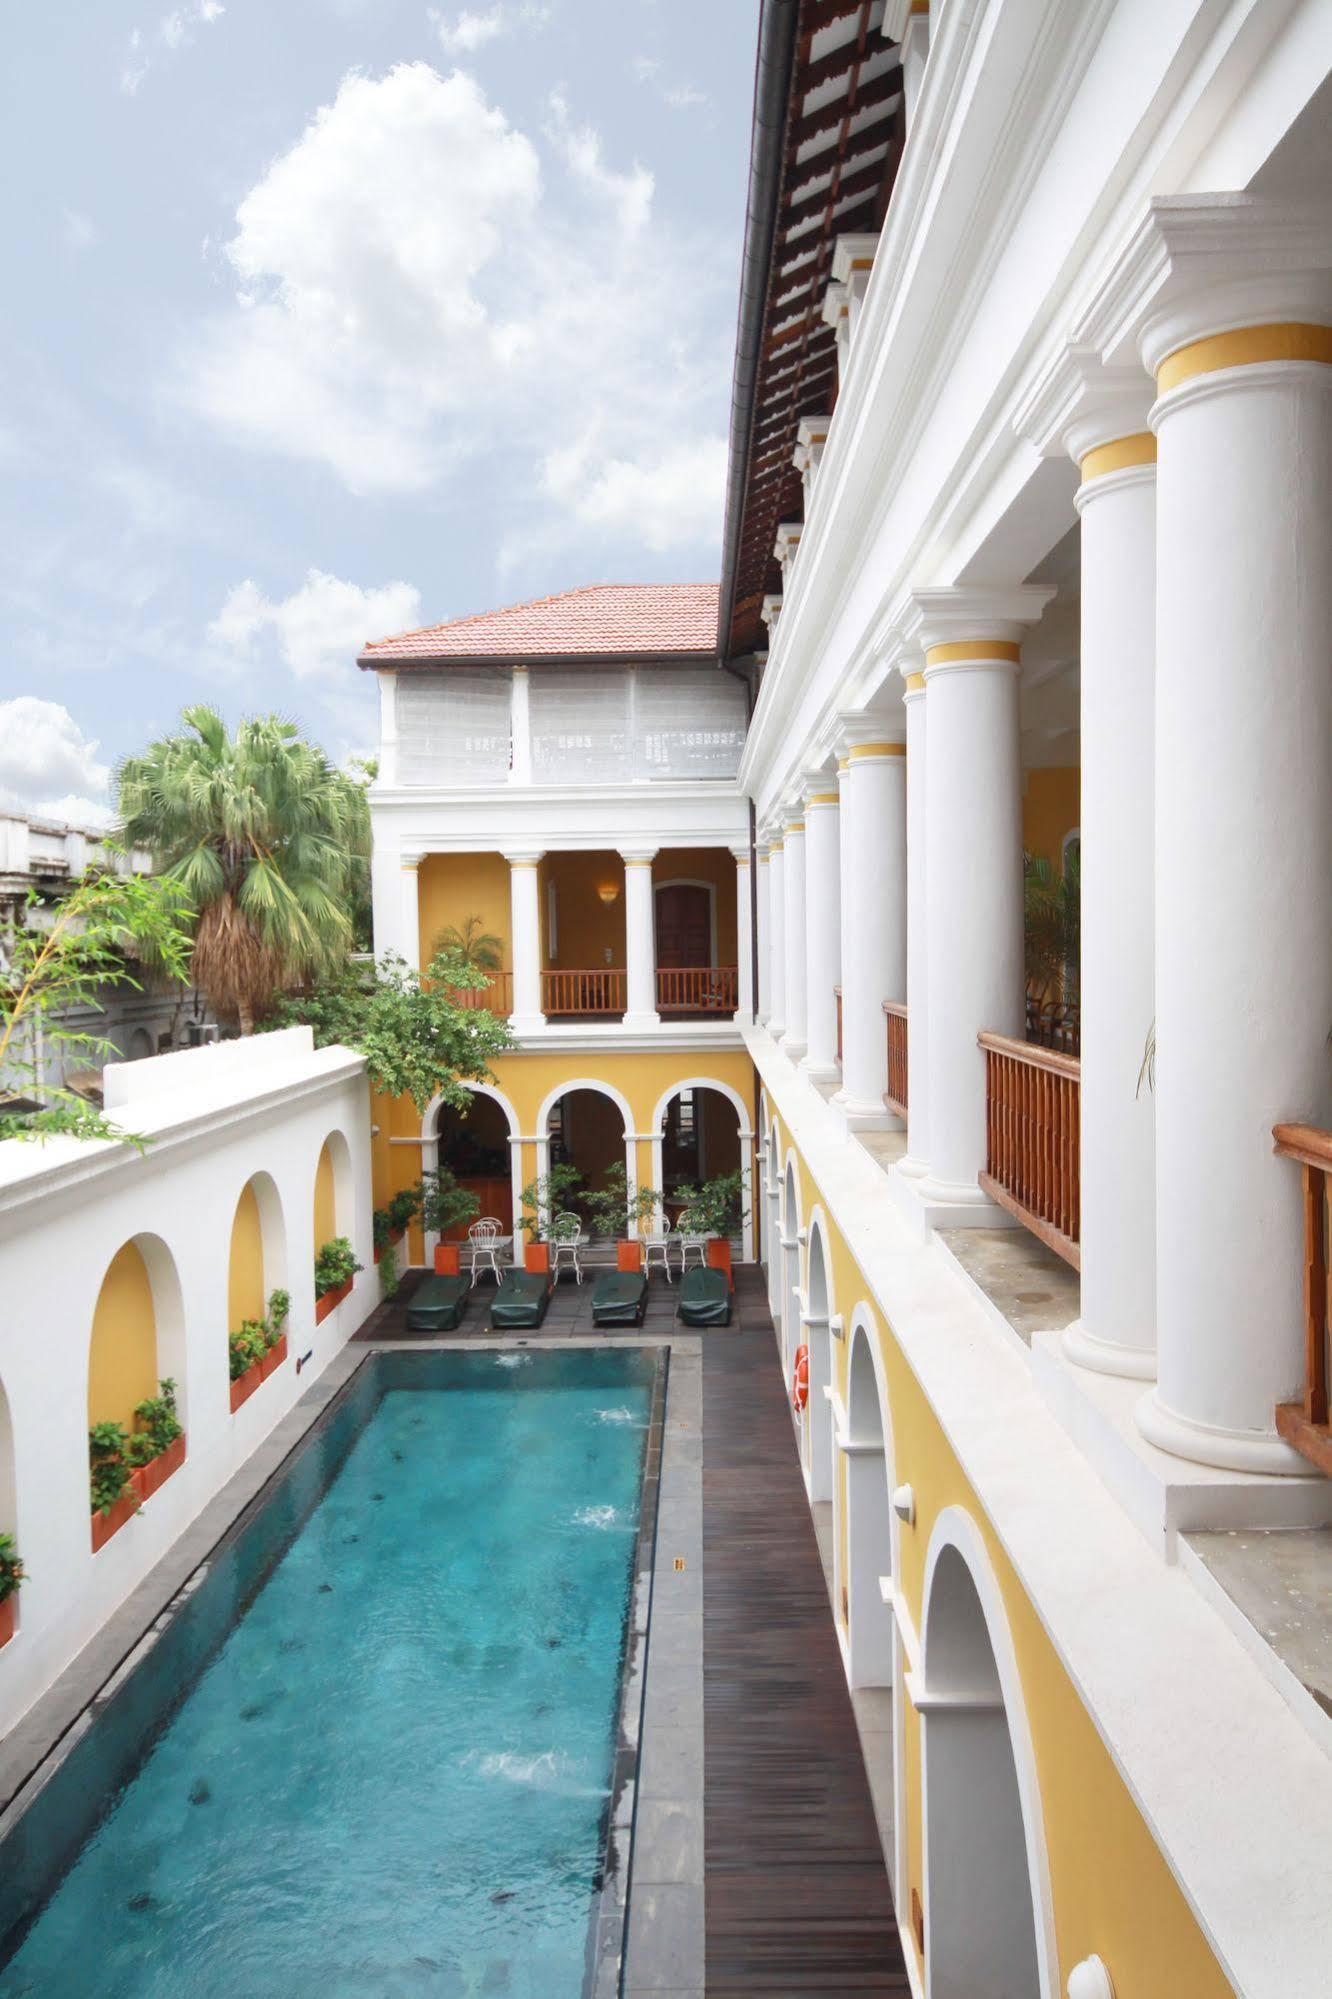 Palais De Mahe, Pondicherry Image 0